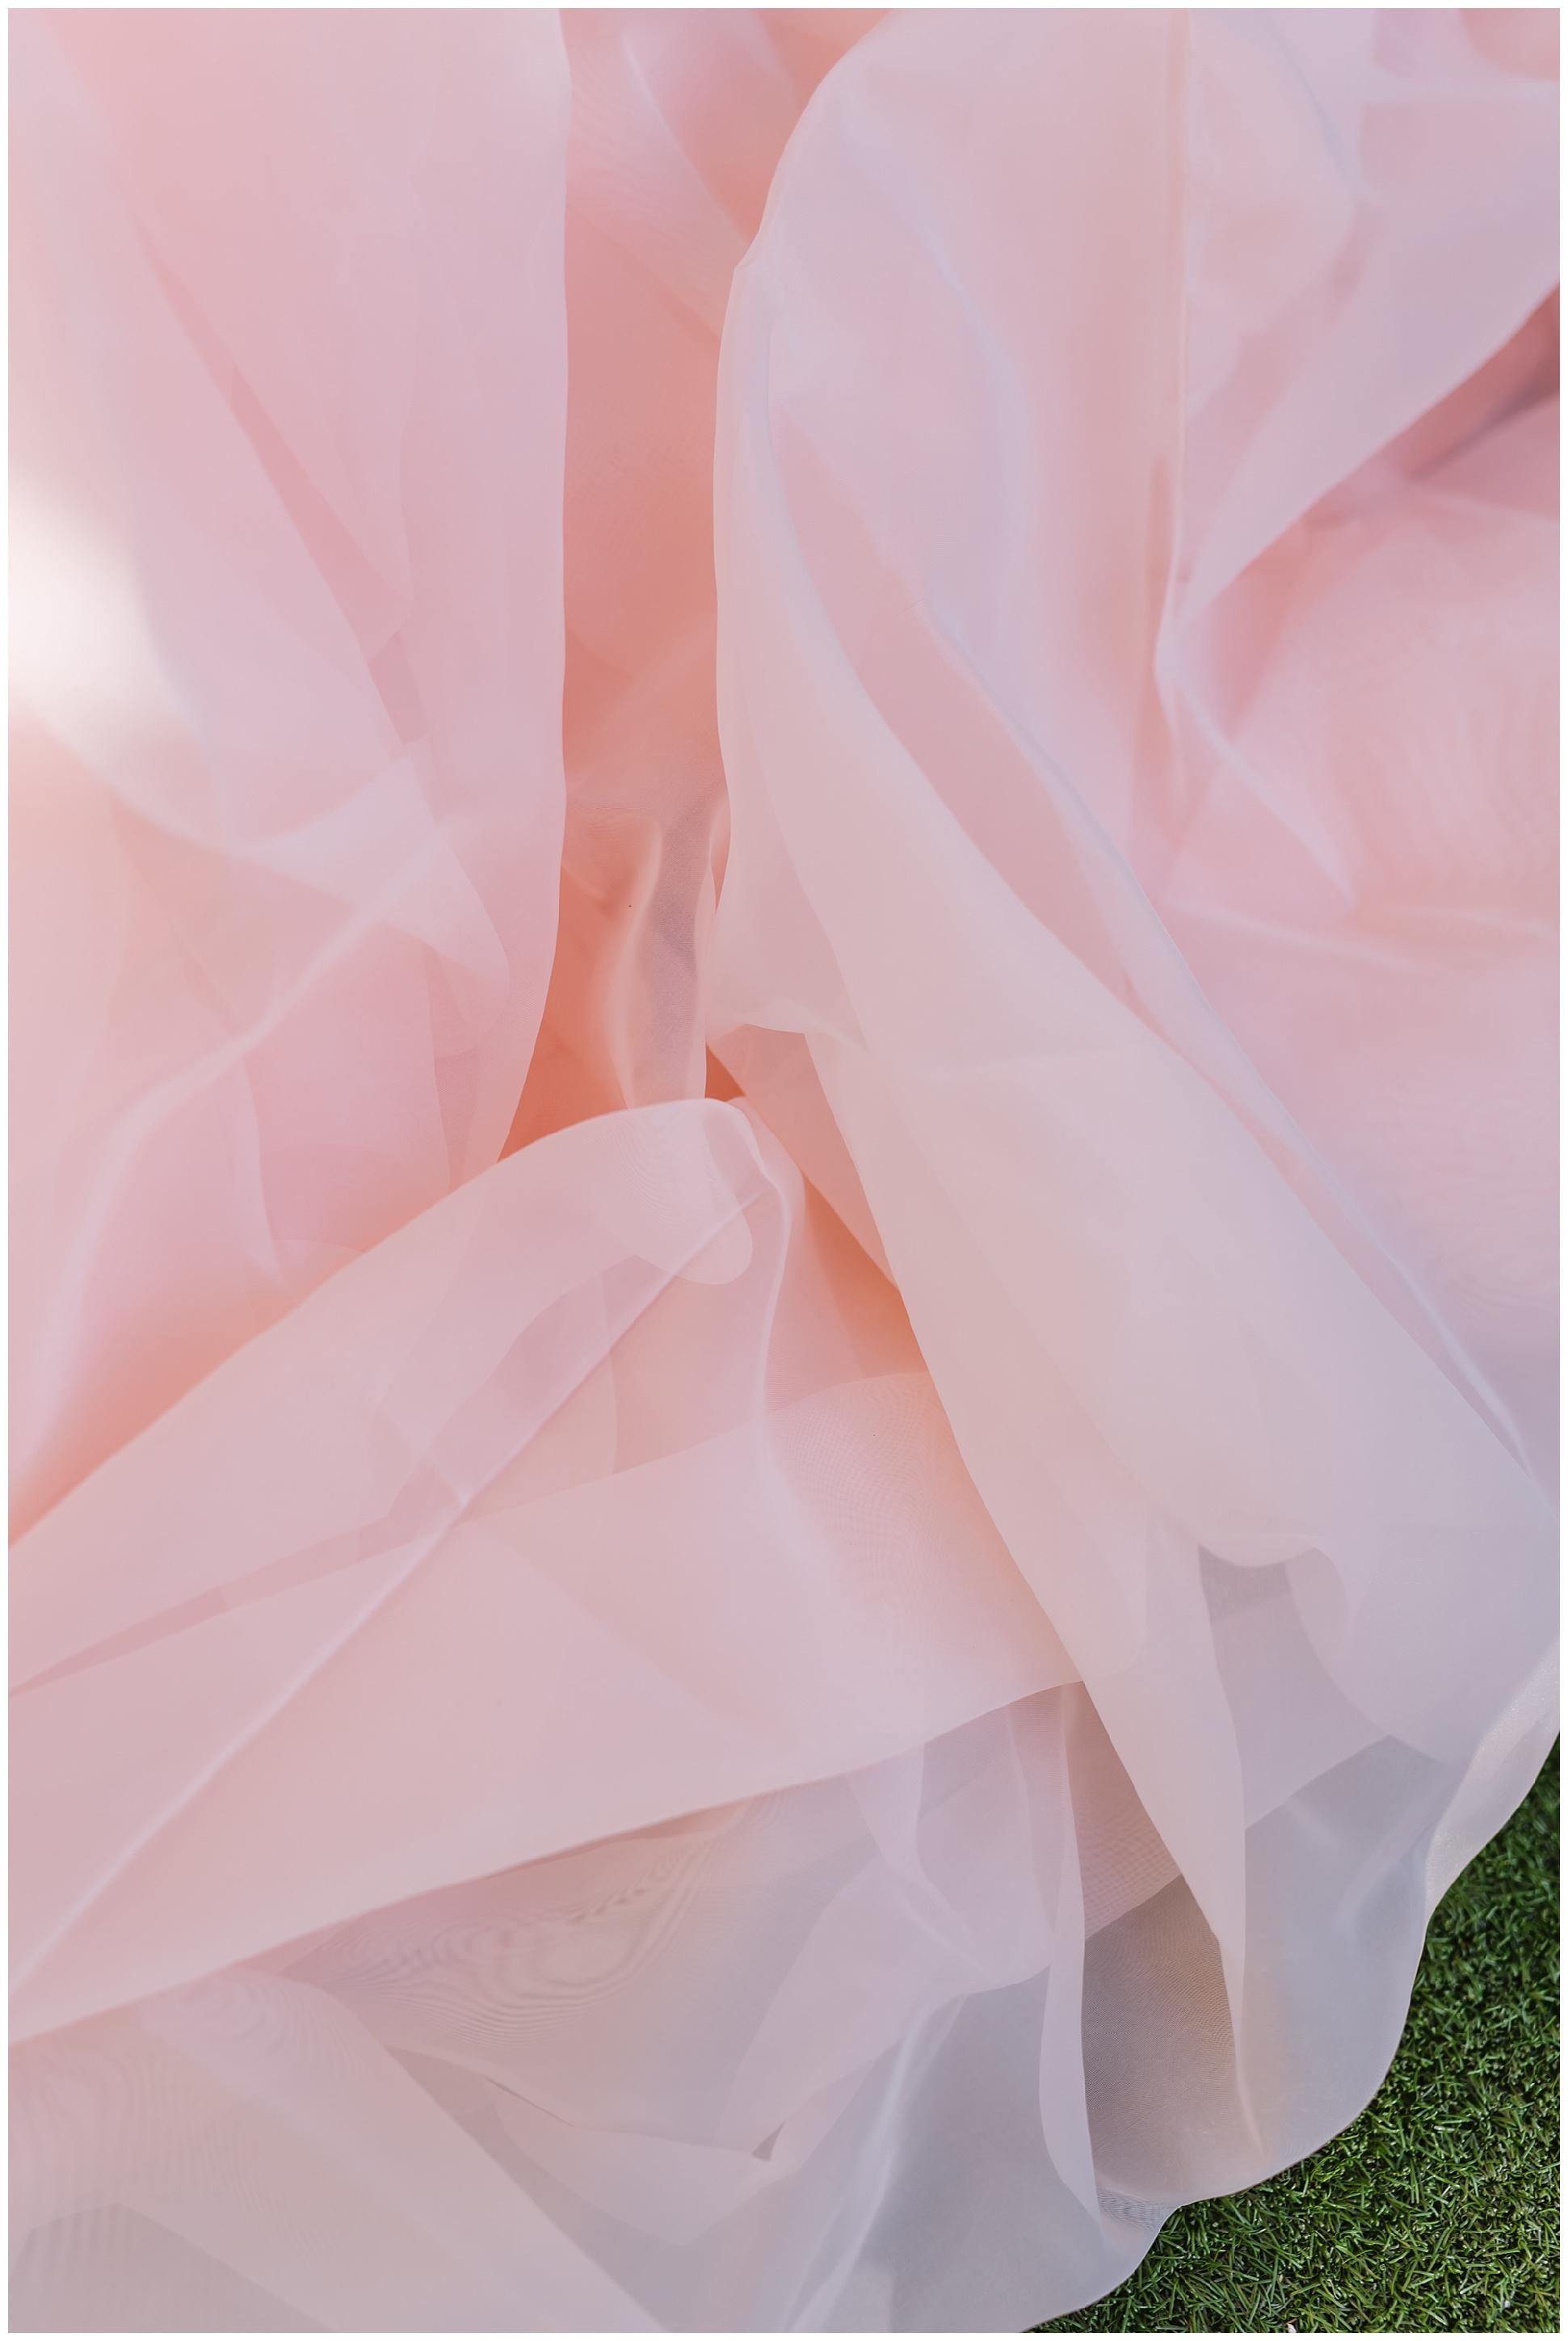 Sarasota-wedding-photographer-hyatt-regency-blush_0030.jpg